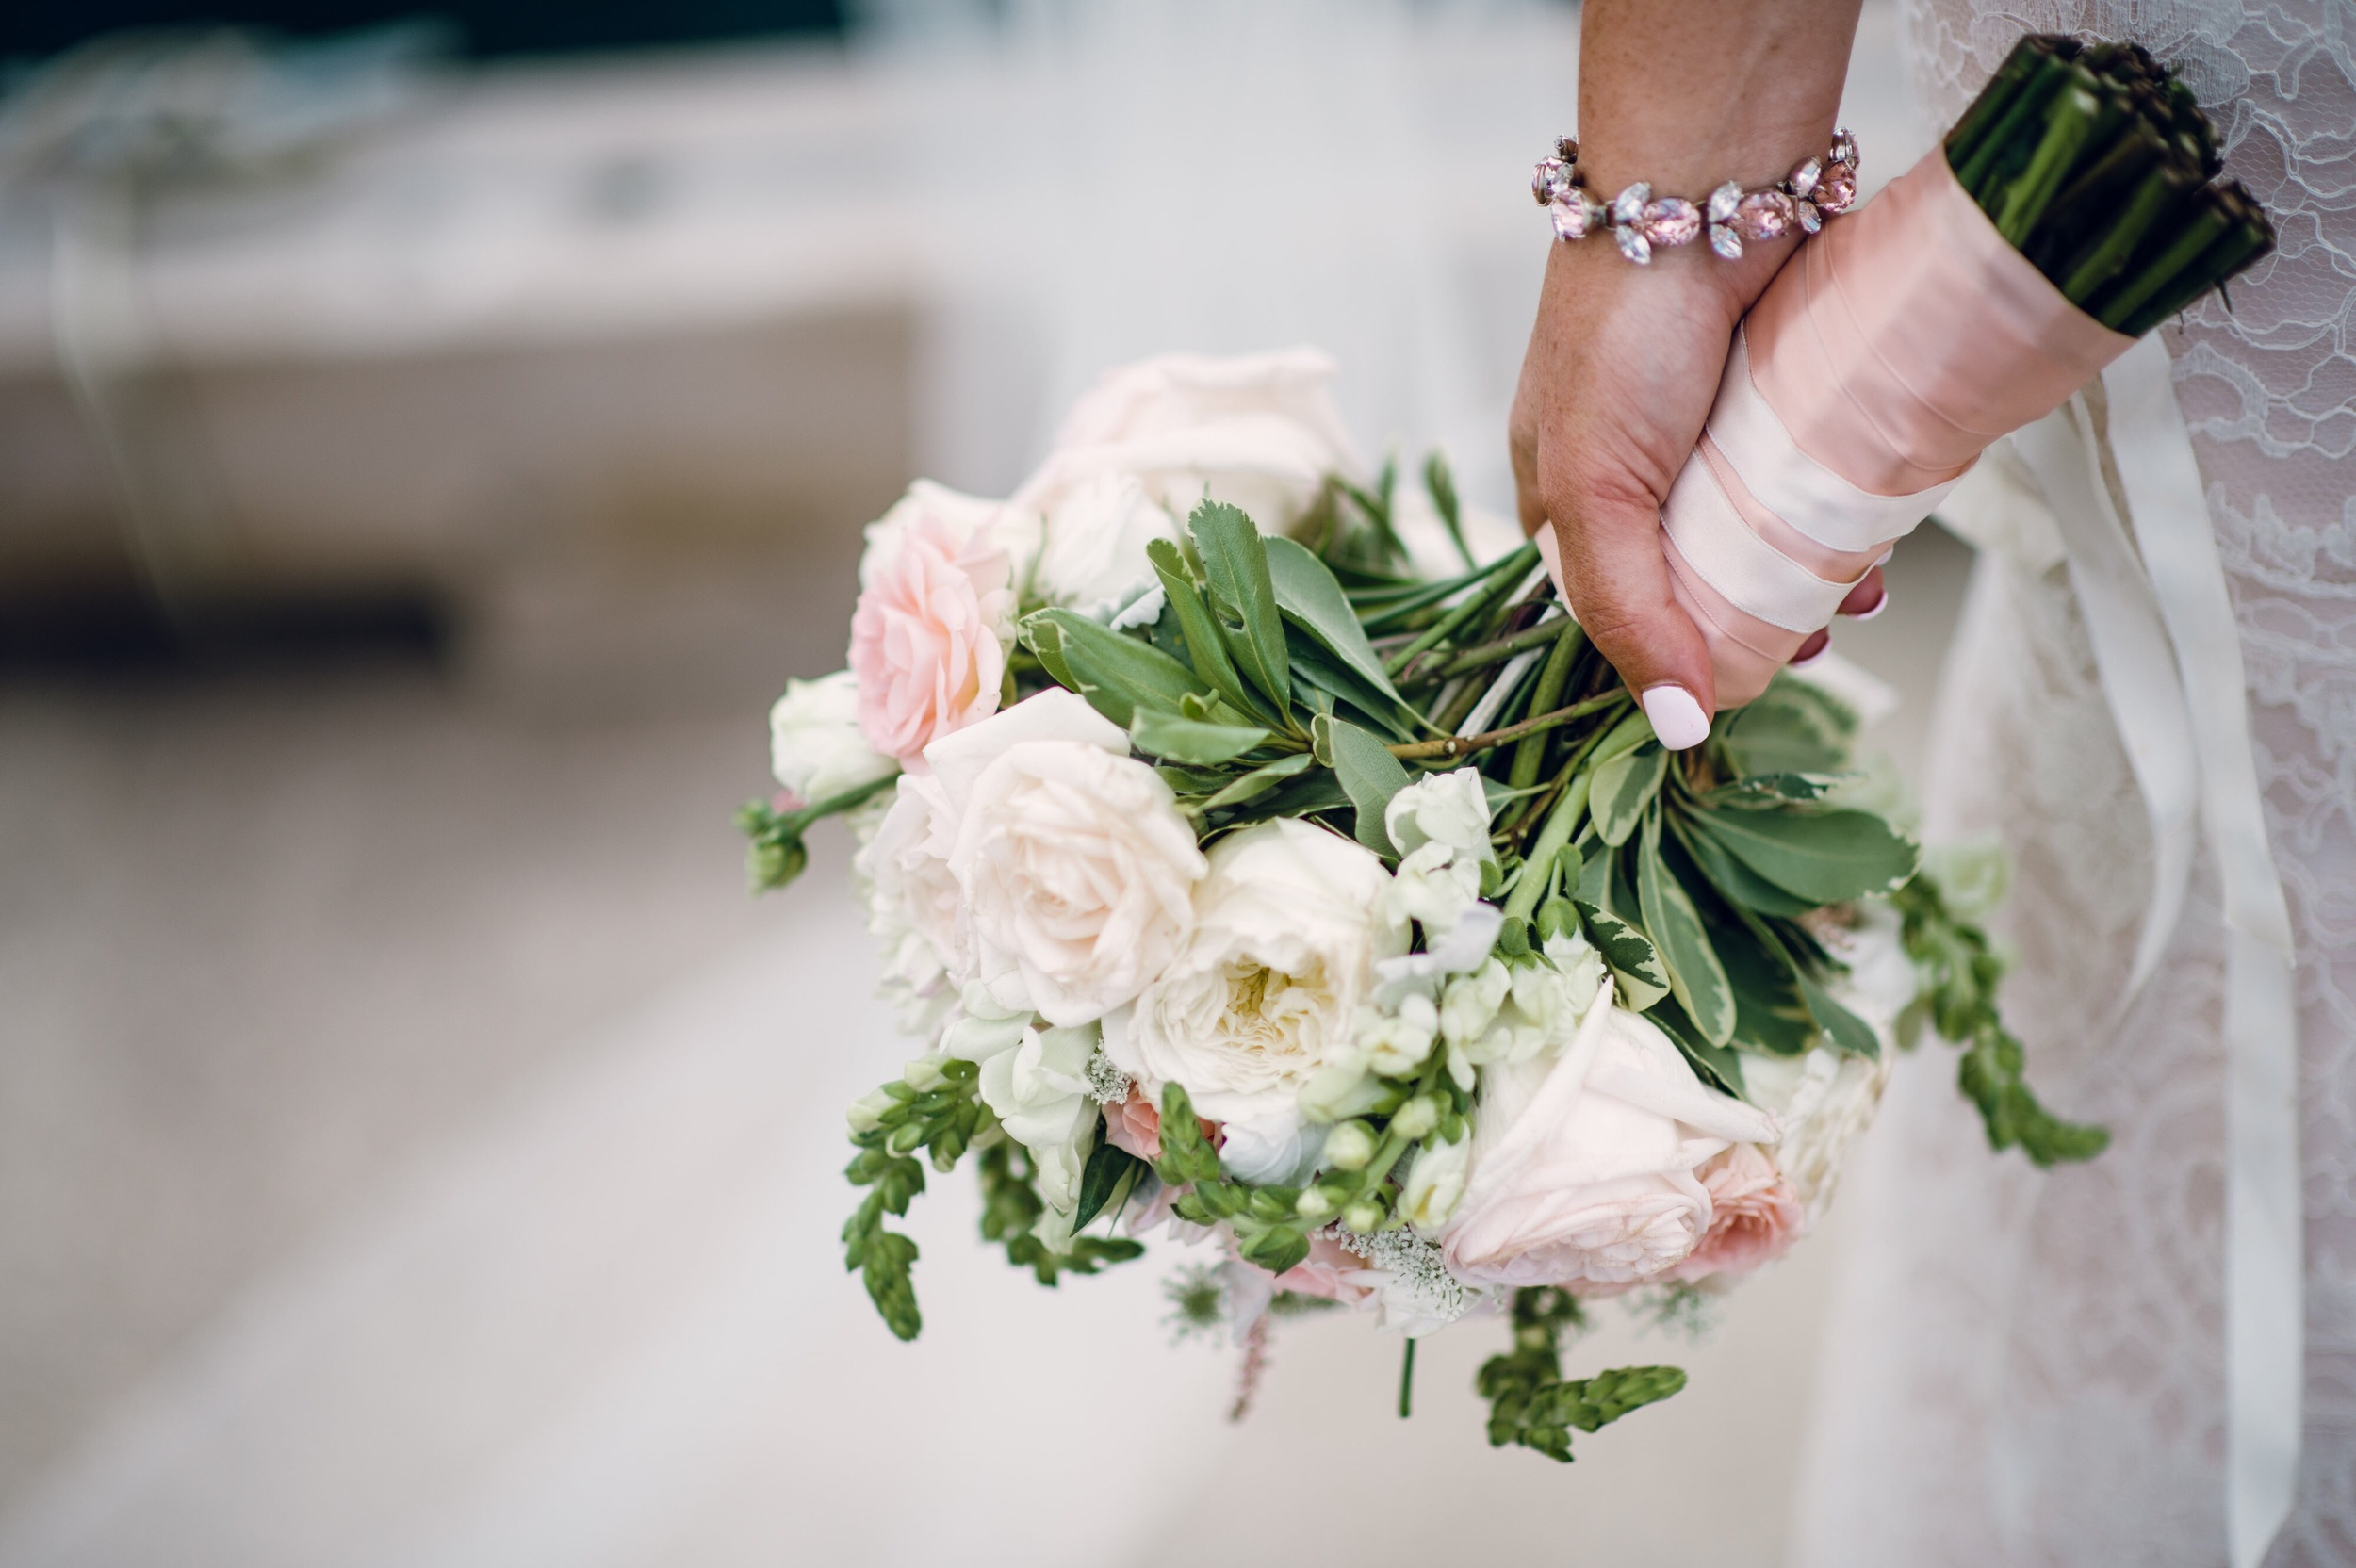 Wedding Bracelet, Pink Jewelry, Edmonton Calgary Vancouver Toronto  Wedding Jewelry by Elsa Corsi, www.elsacorsi.com/blog/love-marriage-baby-carriage